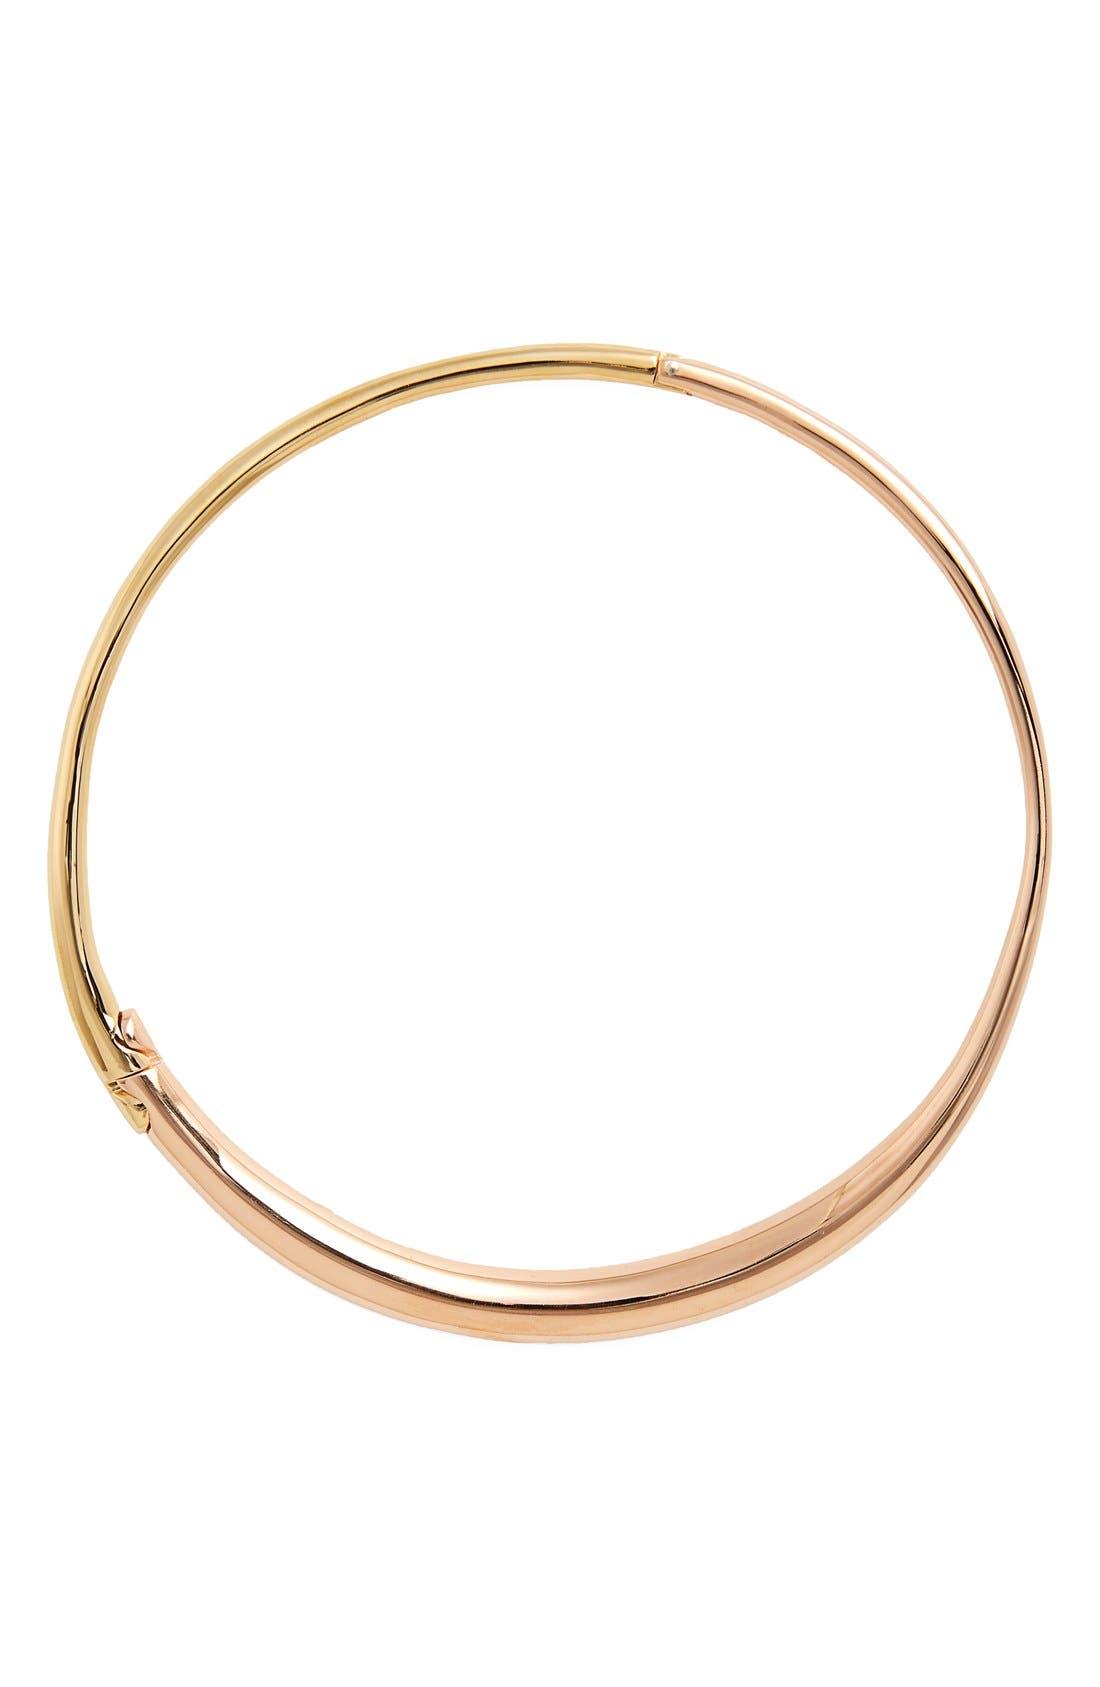 Charlotte Chesnais 'Boi' Collar Necklace